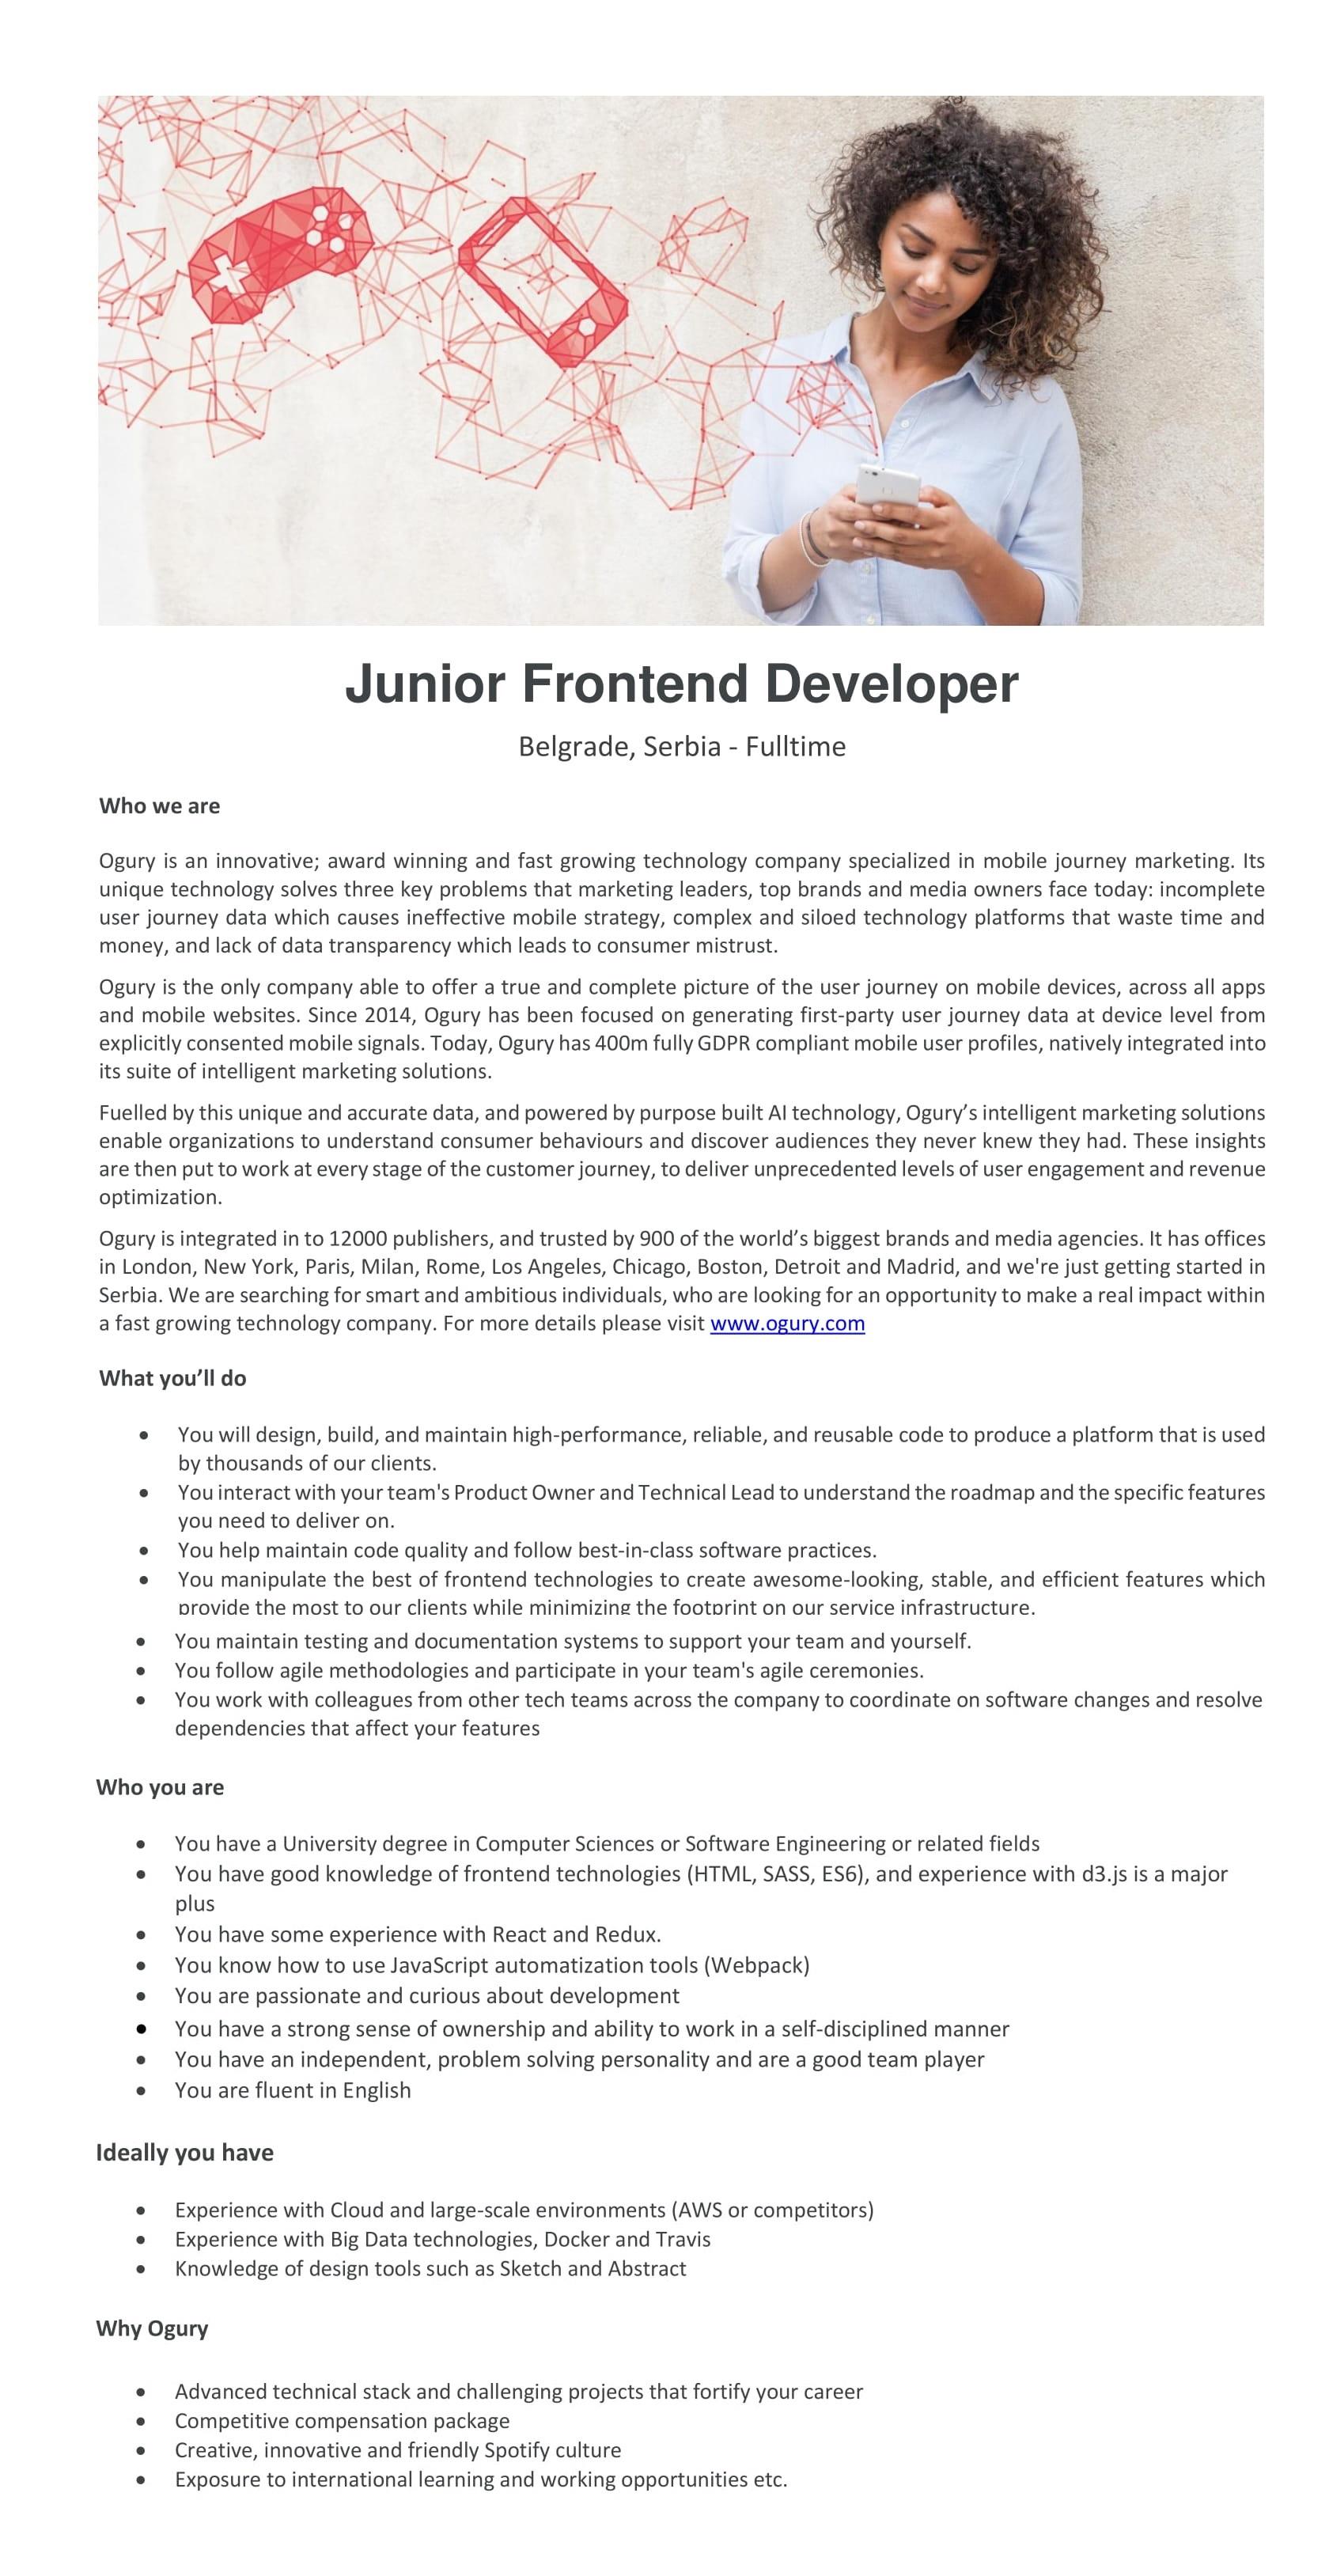 Junior Fronted Developer